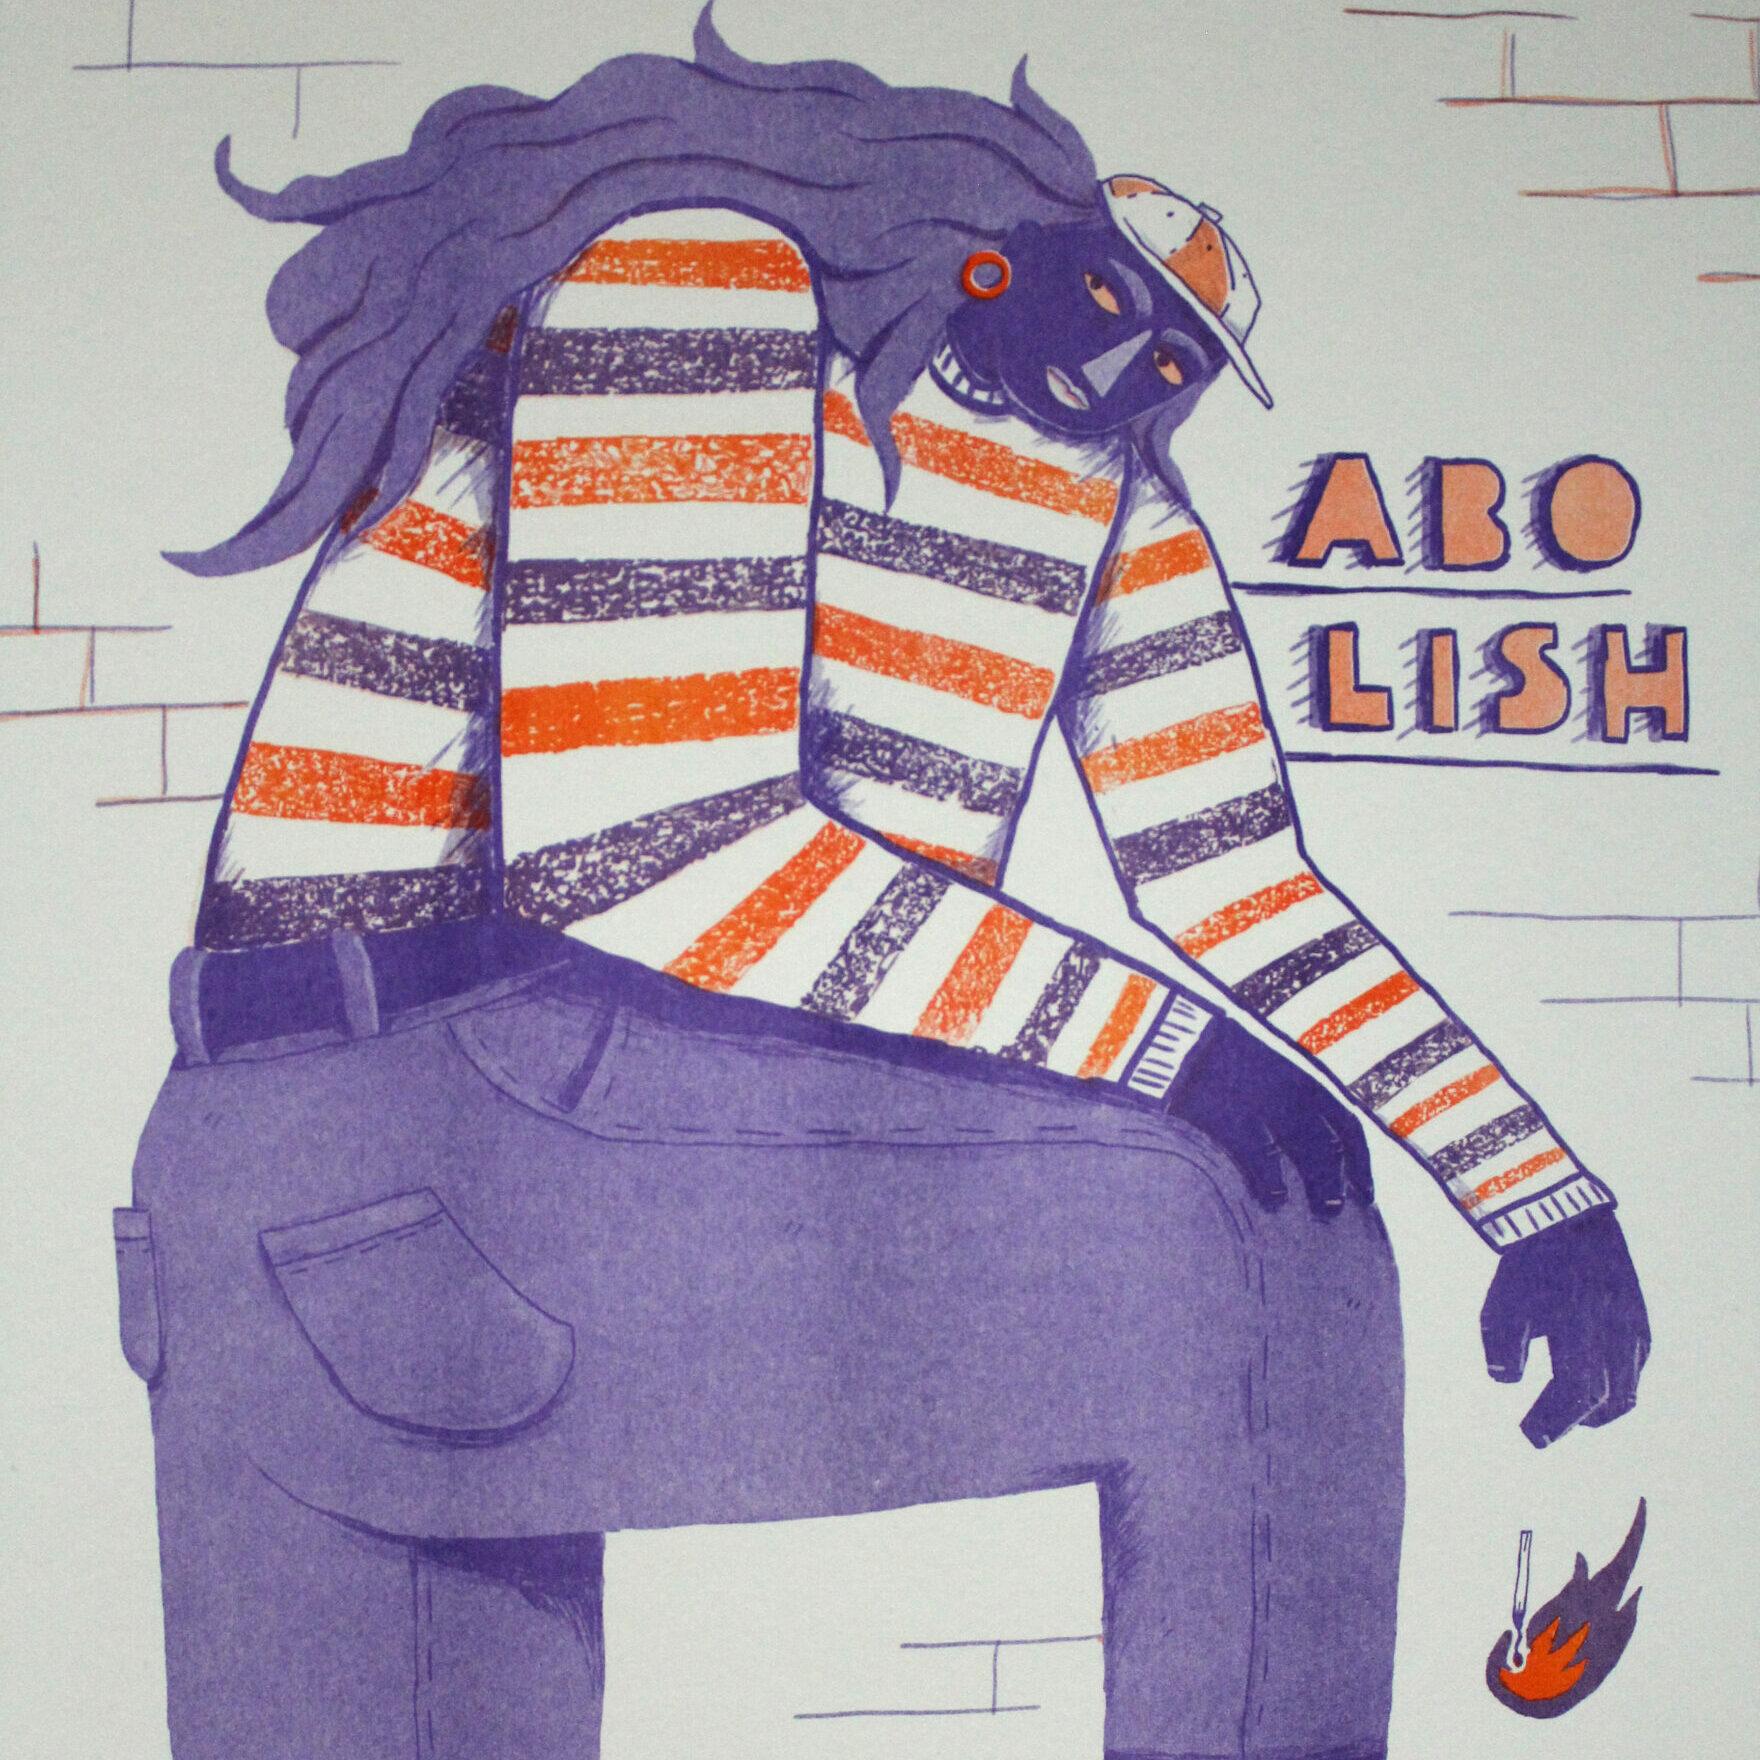 Abolish — Defund (Poster)